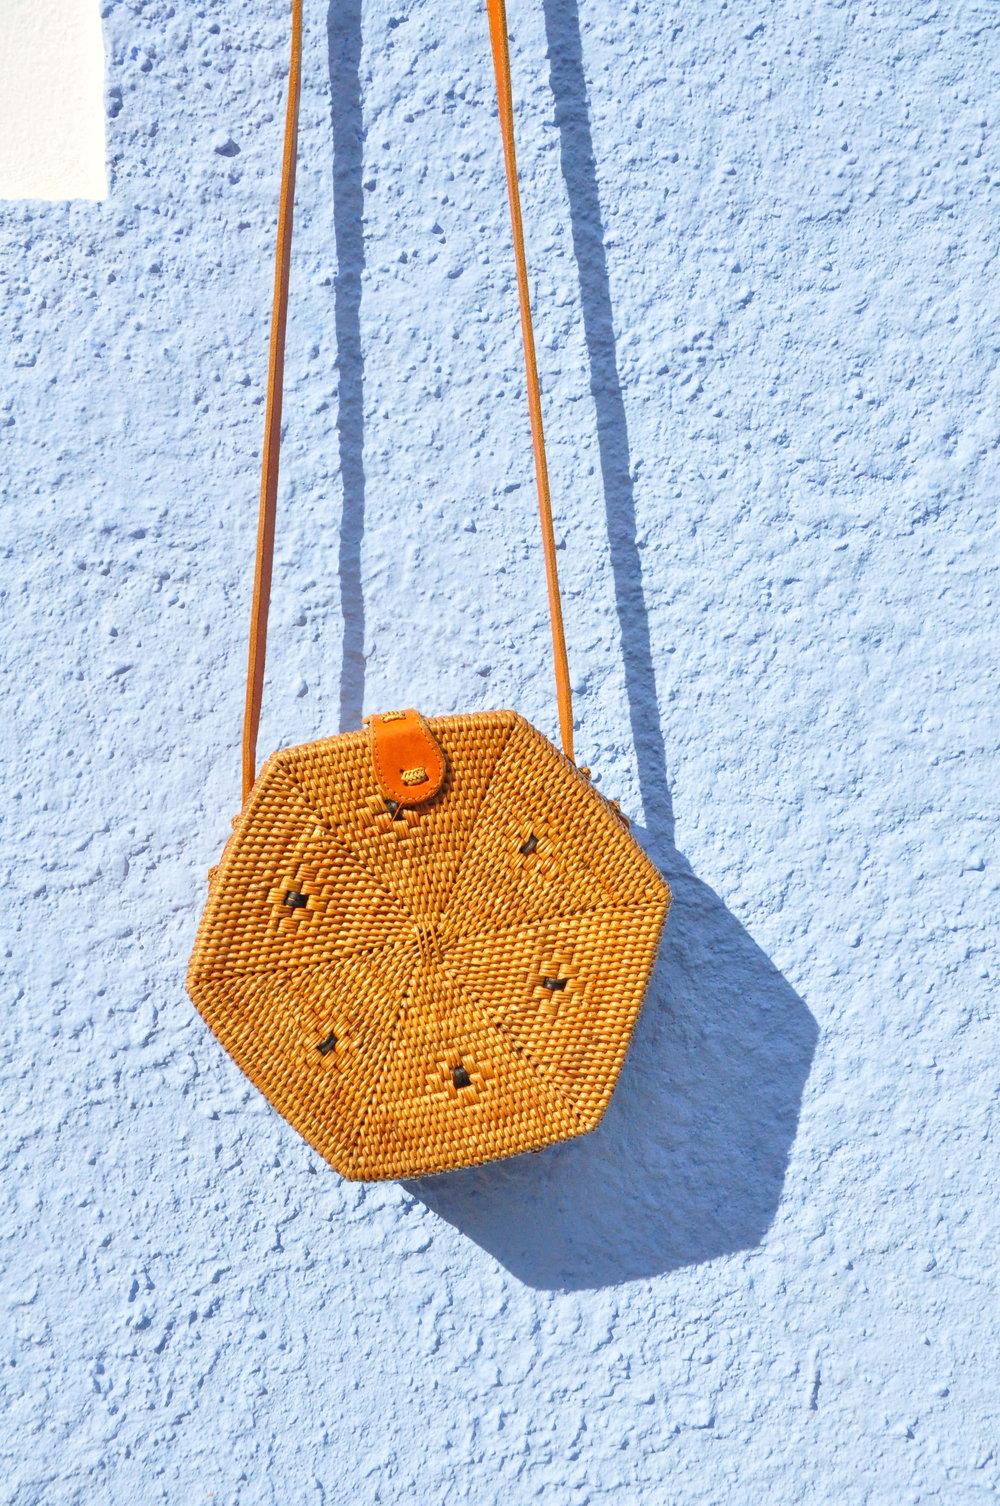 Rattan hexagon bag against blue wall    A  day in Tavira    Algarve, Portugal   Soi 55 Travels